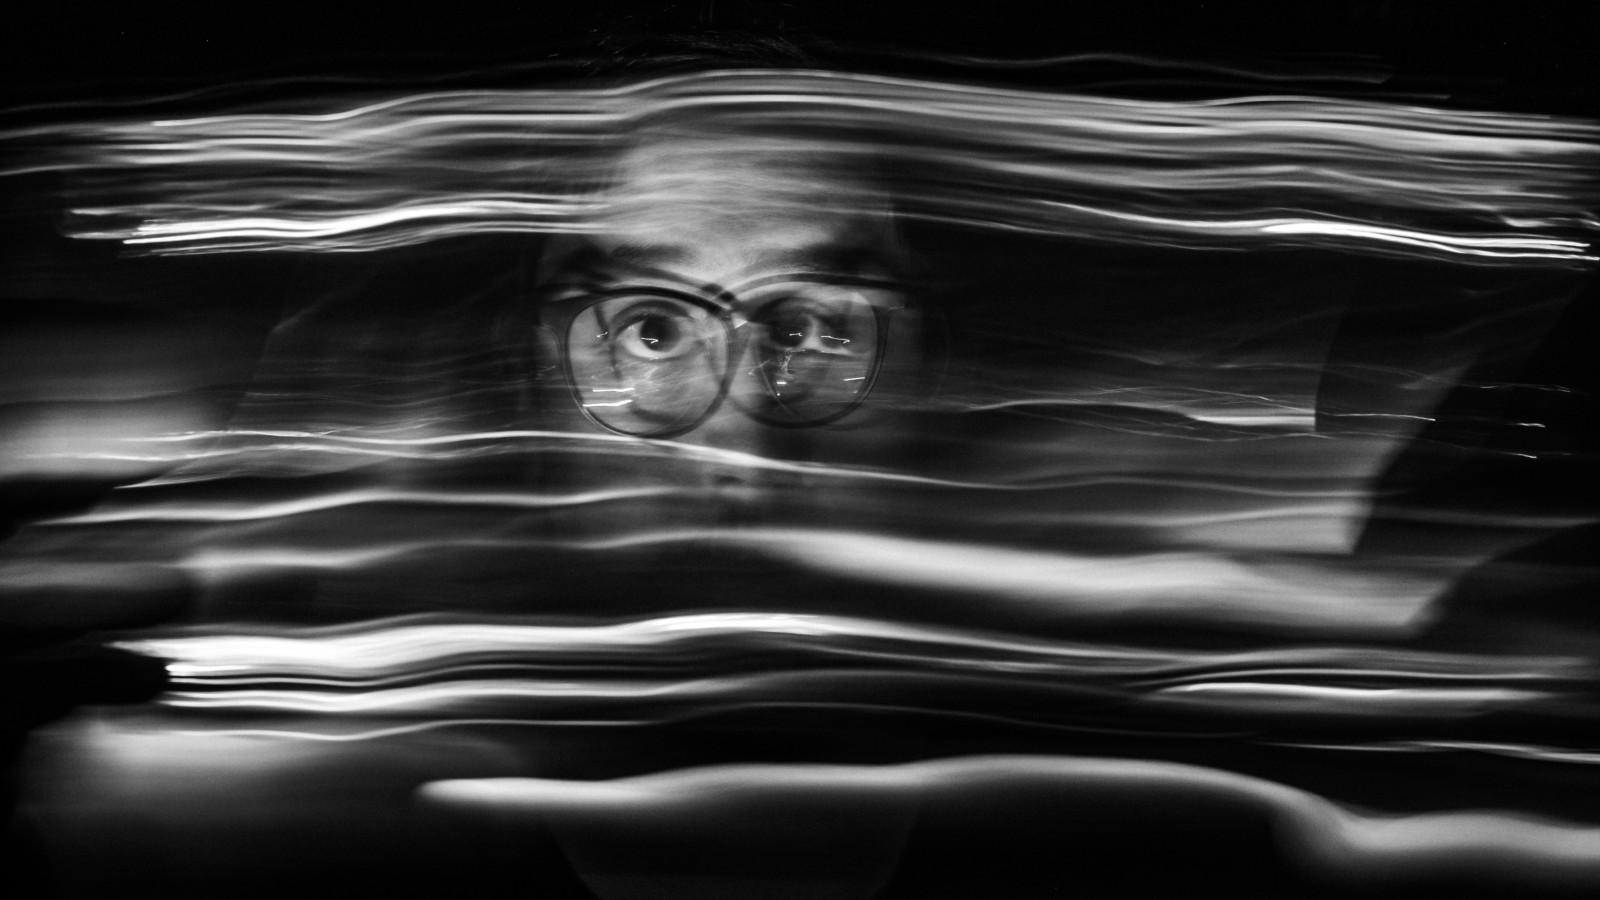 Global Photomarathon Invites Artists To Capture Chaos